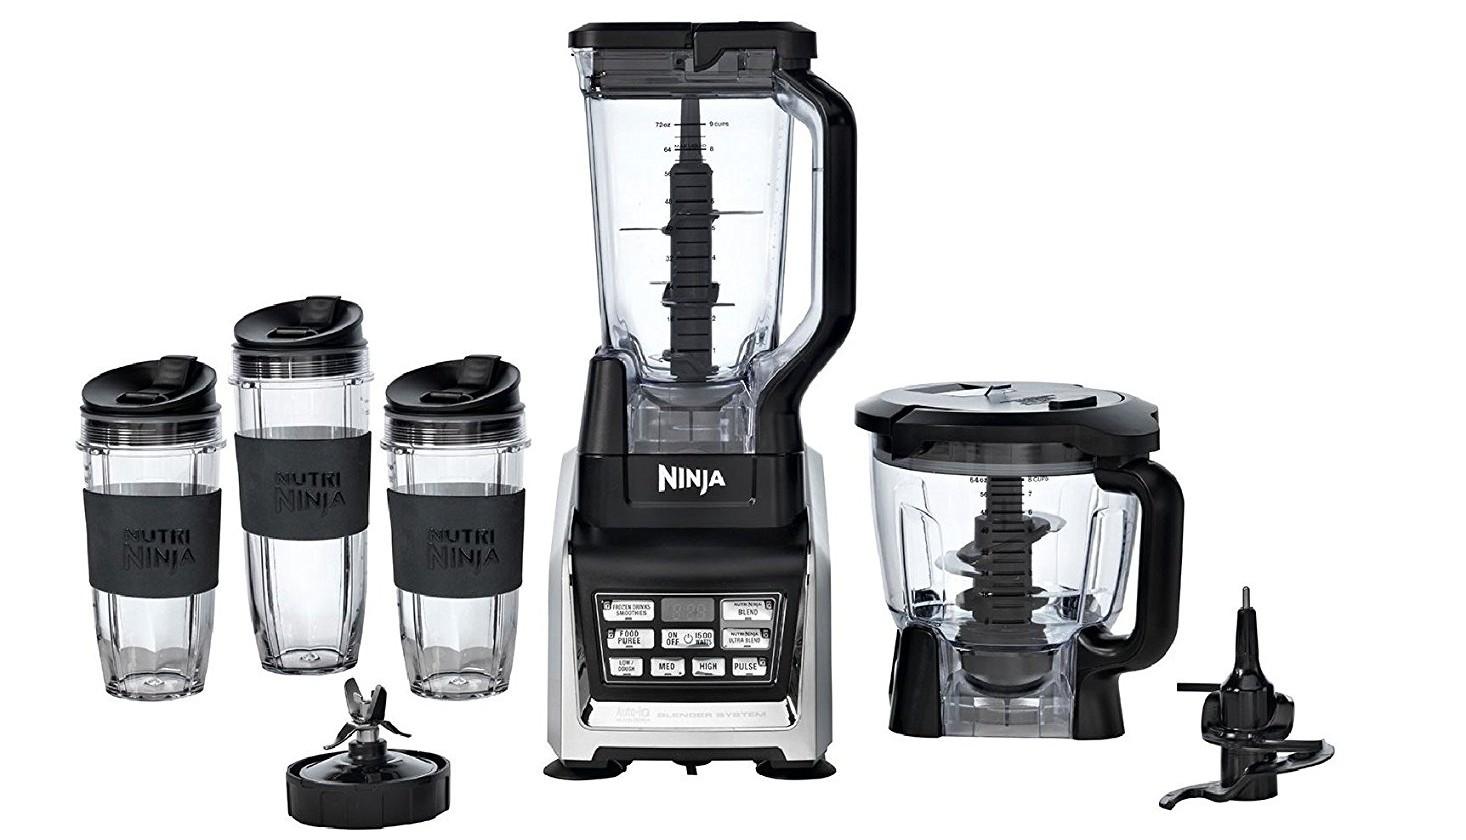 Best blender reviews on the market for 2017 new updated for Think kitchen ultimate pro blender